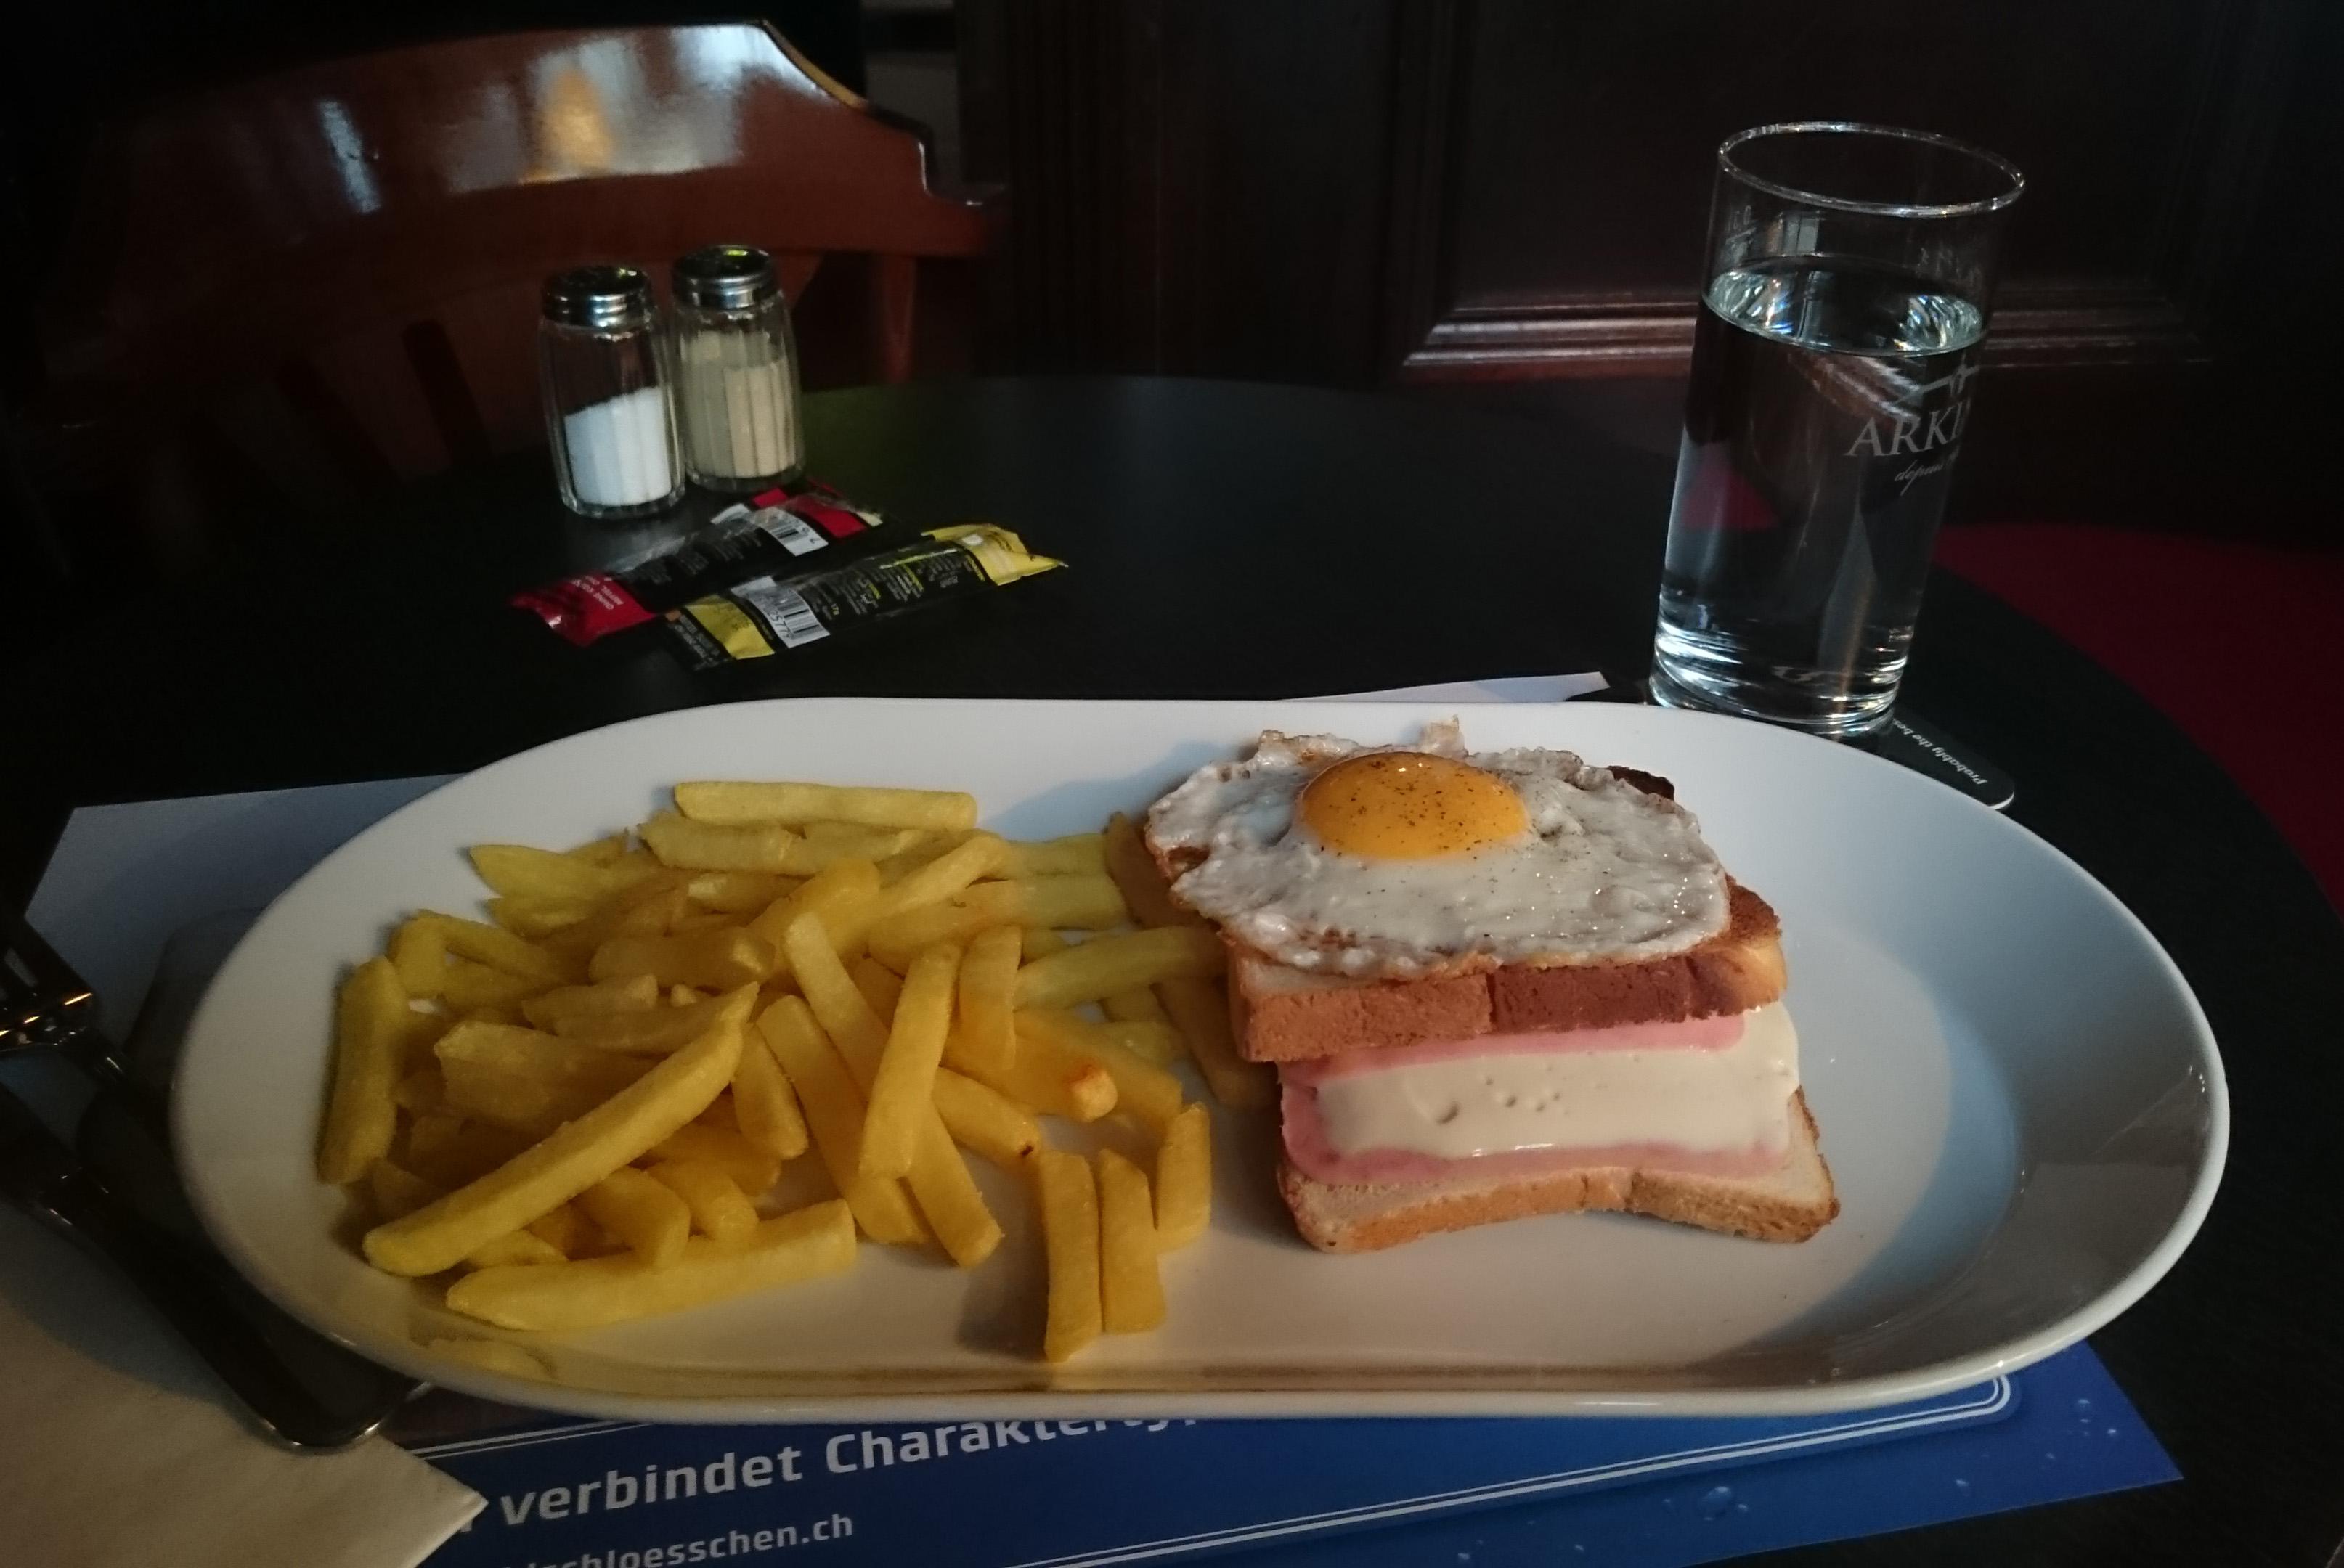 PIC_0036 Sun Lunch - Croque Madame pub food